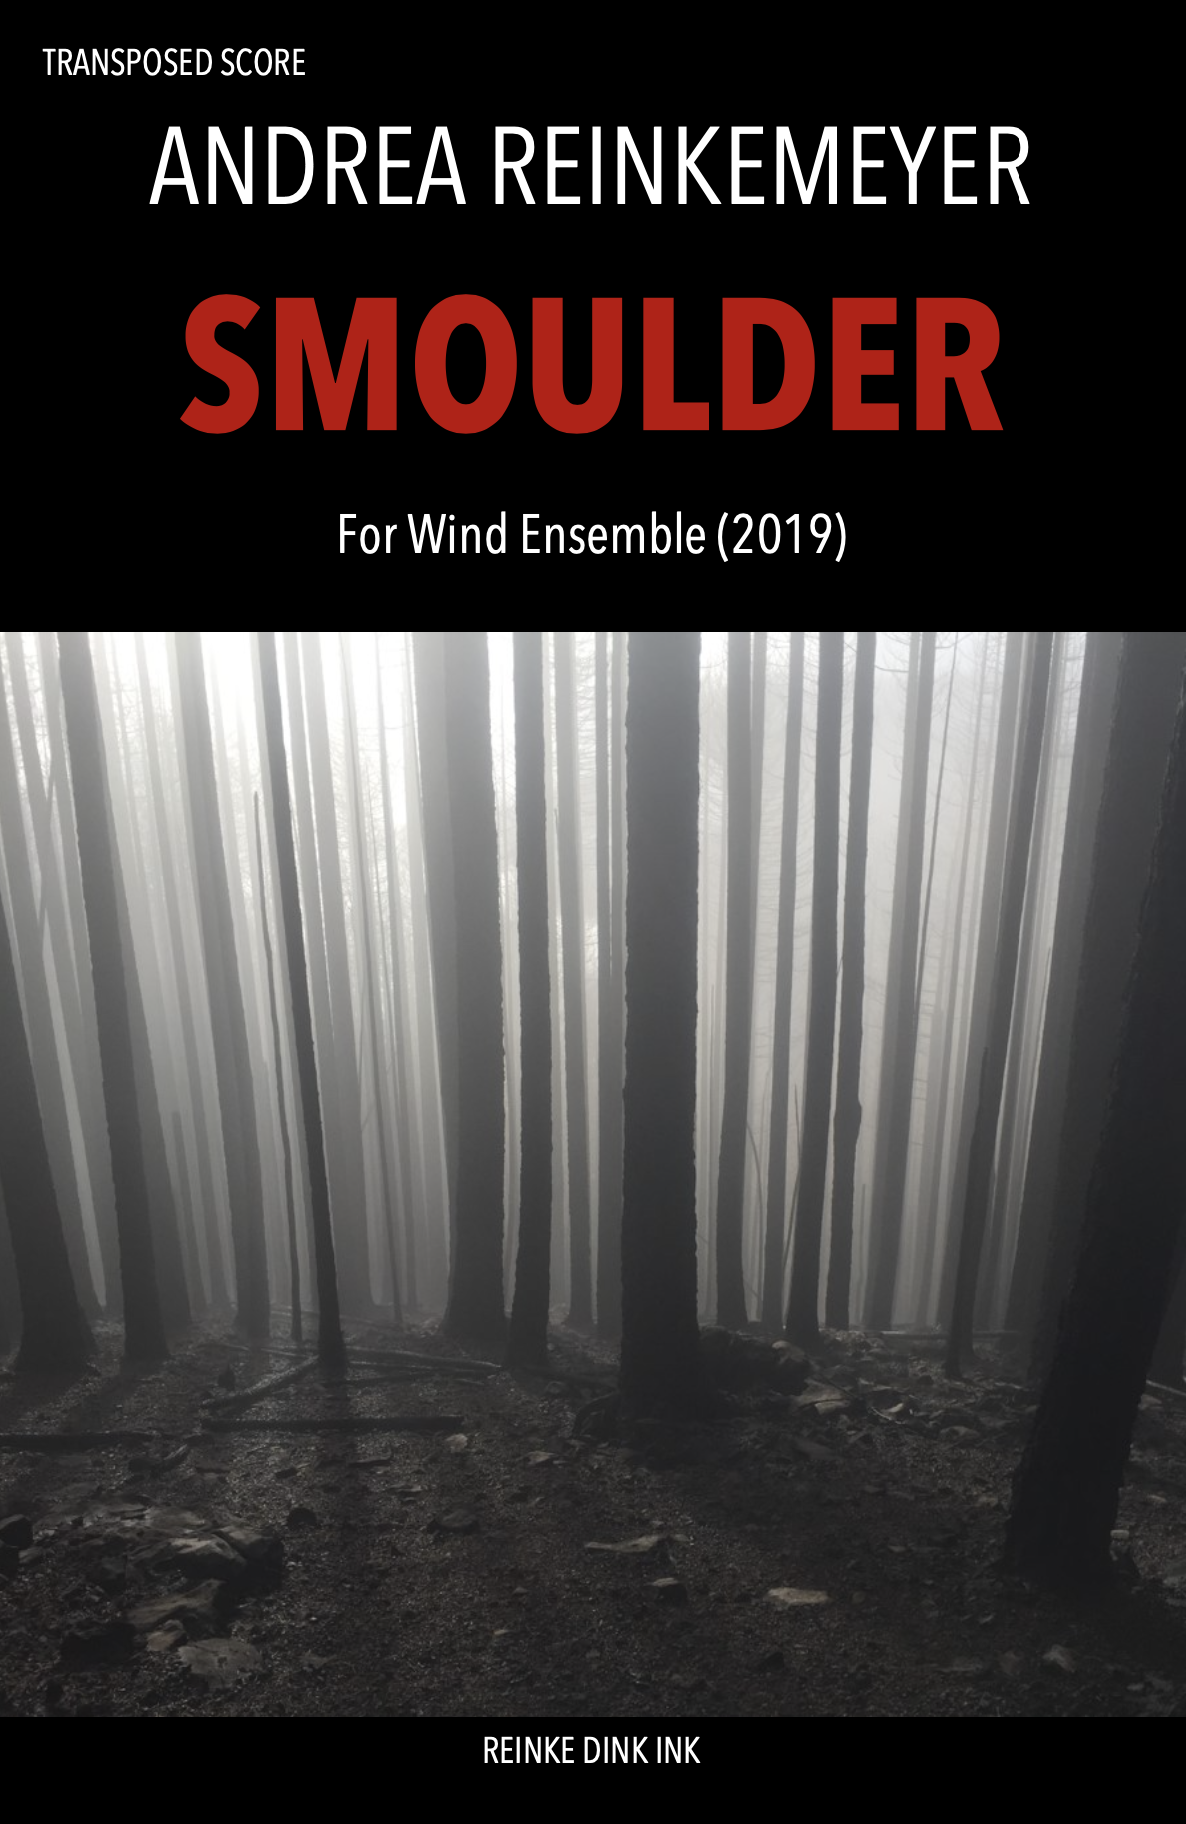 Smoulder by Andrea Reinkemeyer